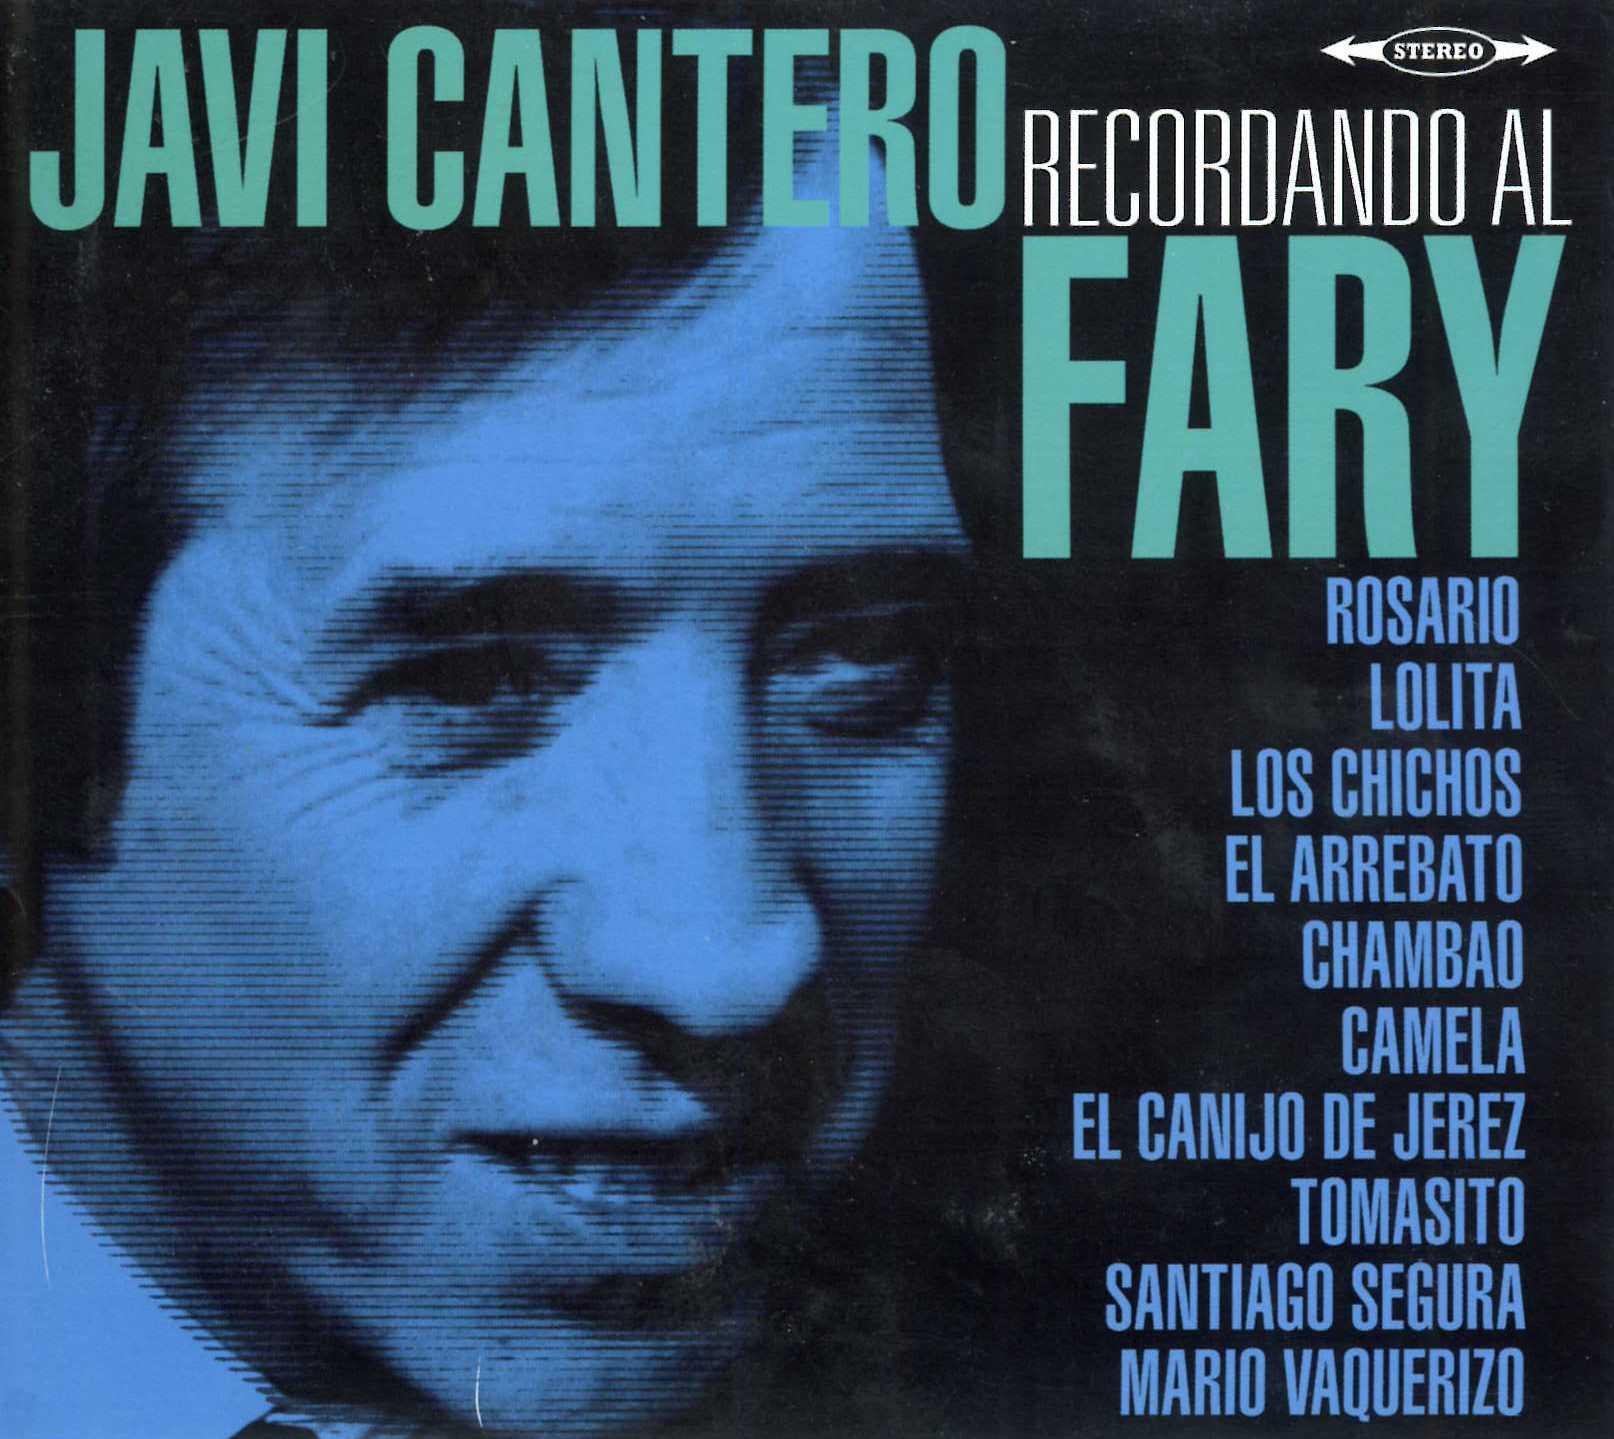 Recordando al Fary